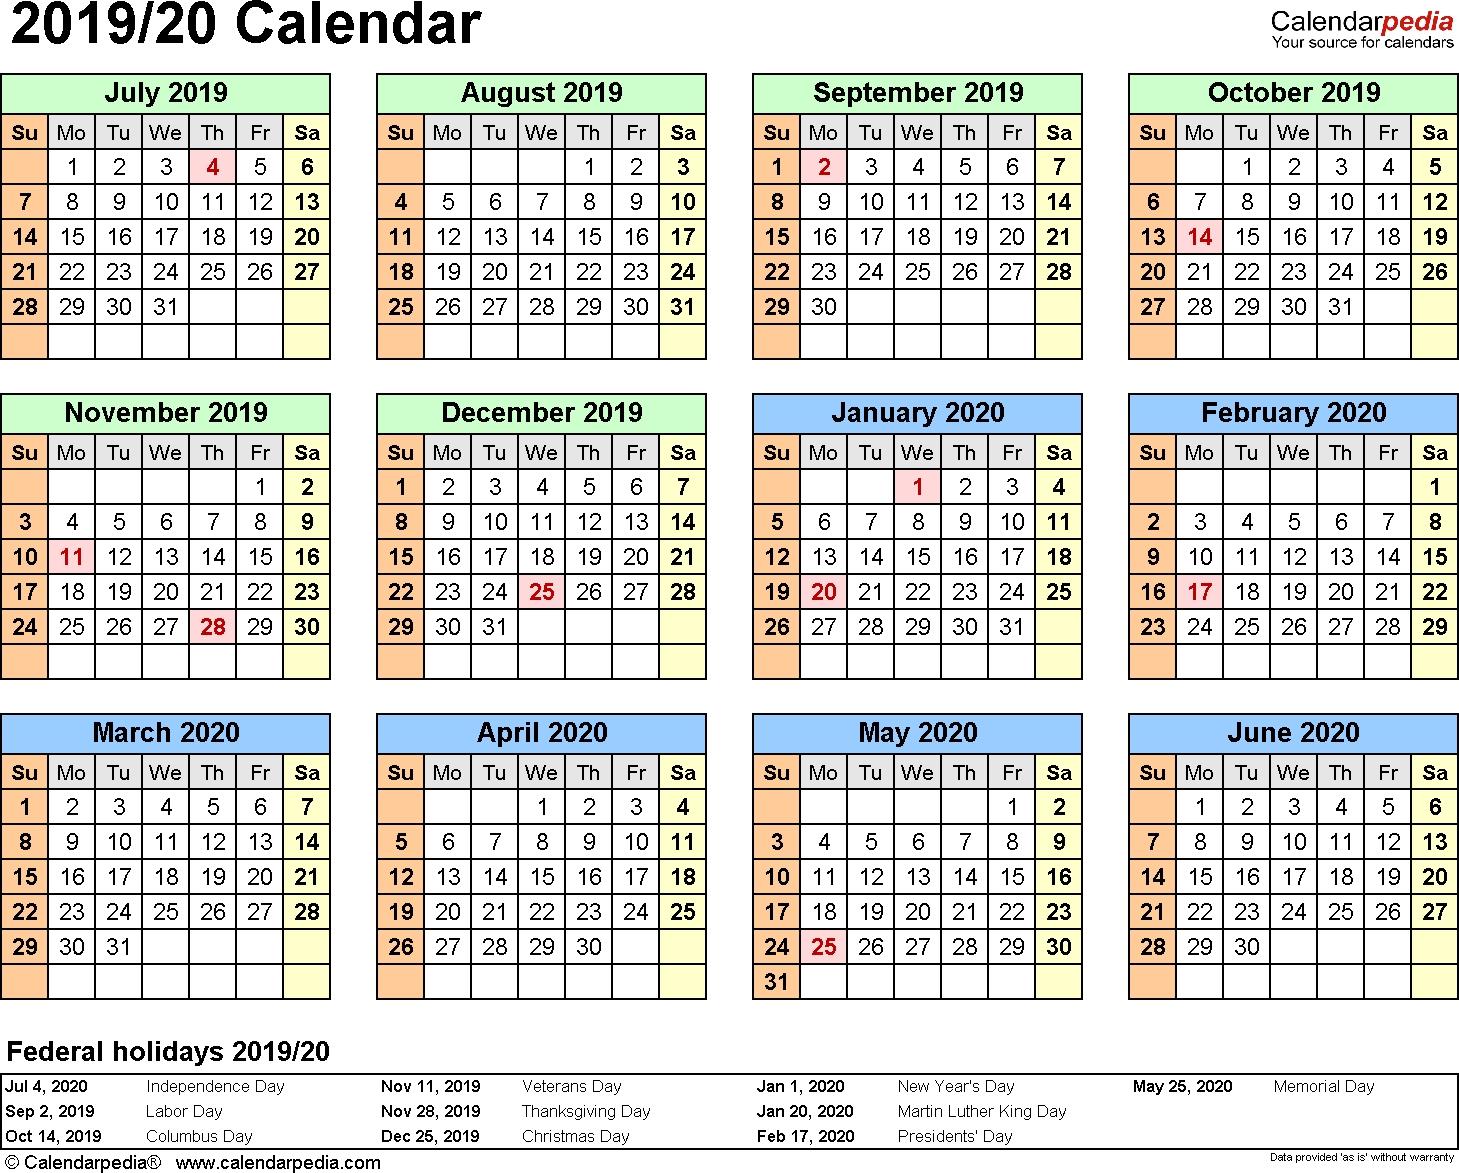 Split Year Calendar 2019/20 (July To June) - Excel Templates  Australian Financial Year Calendar 2020 2010